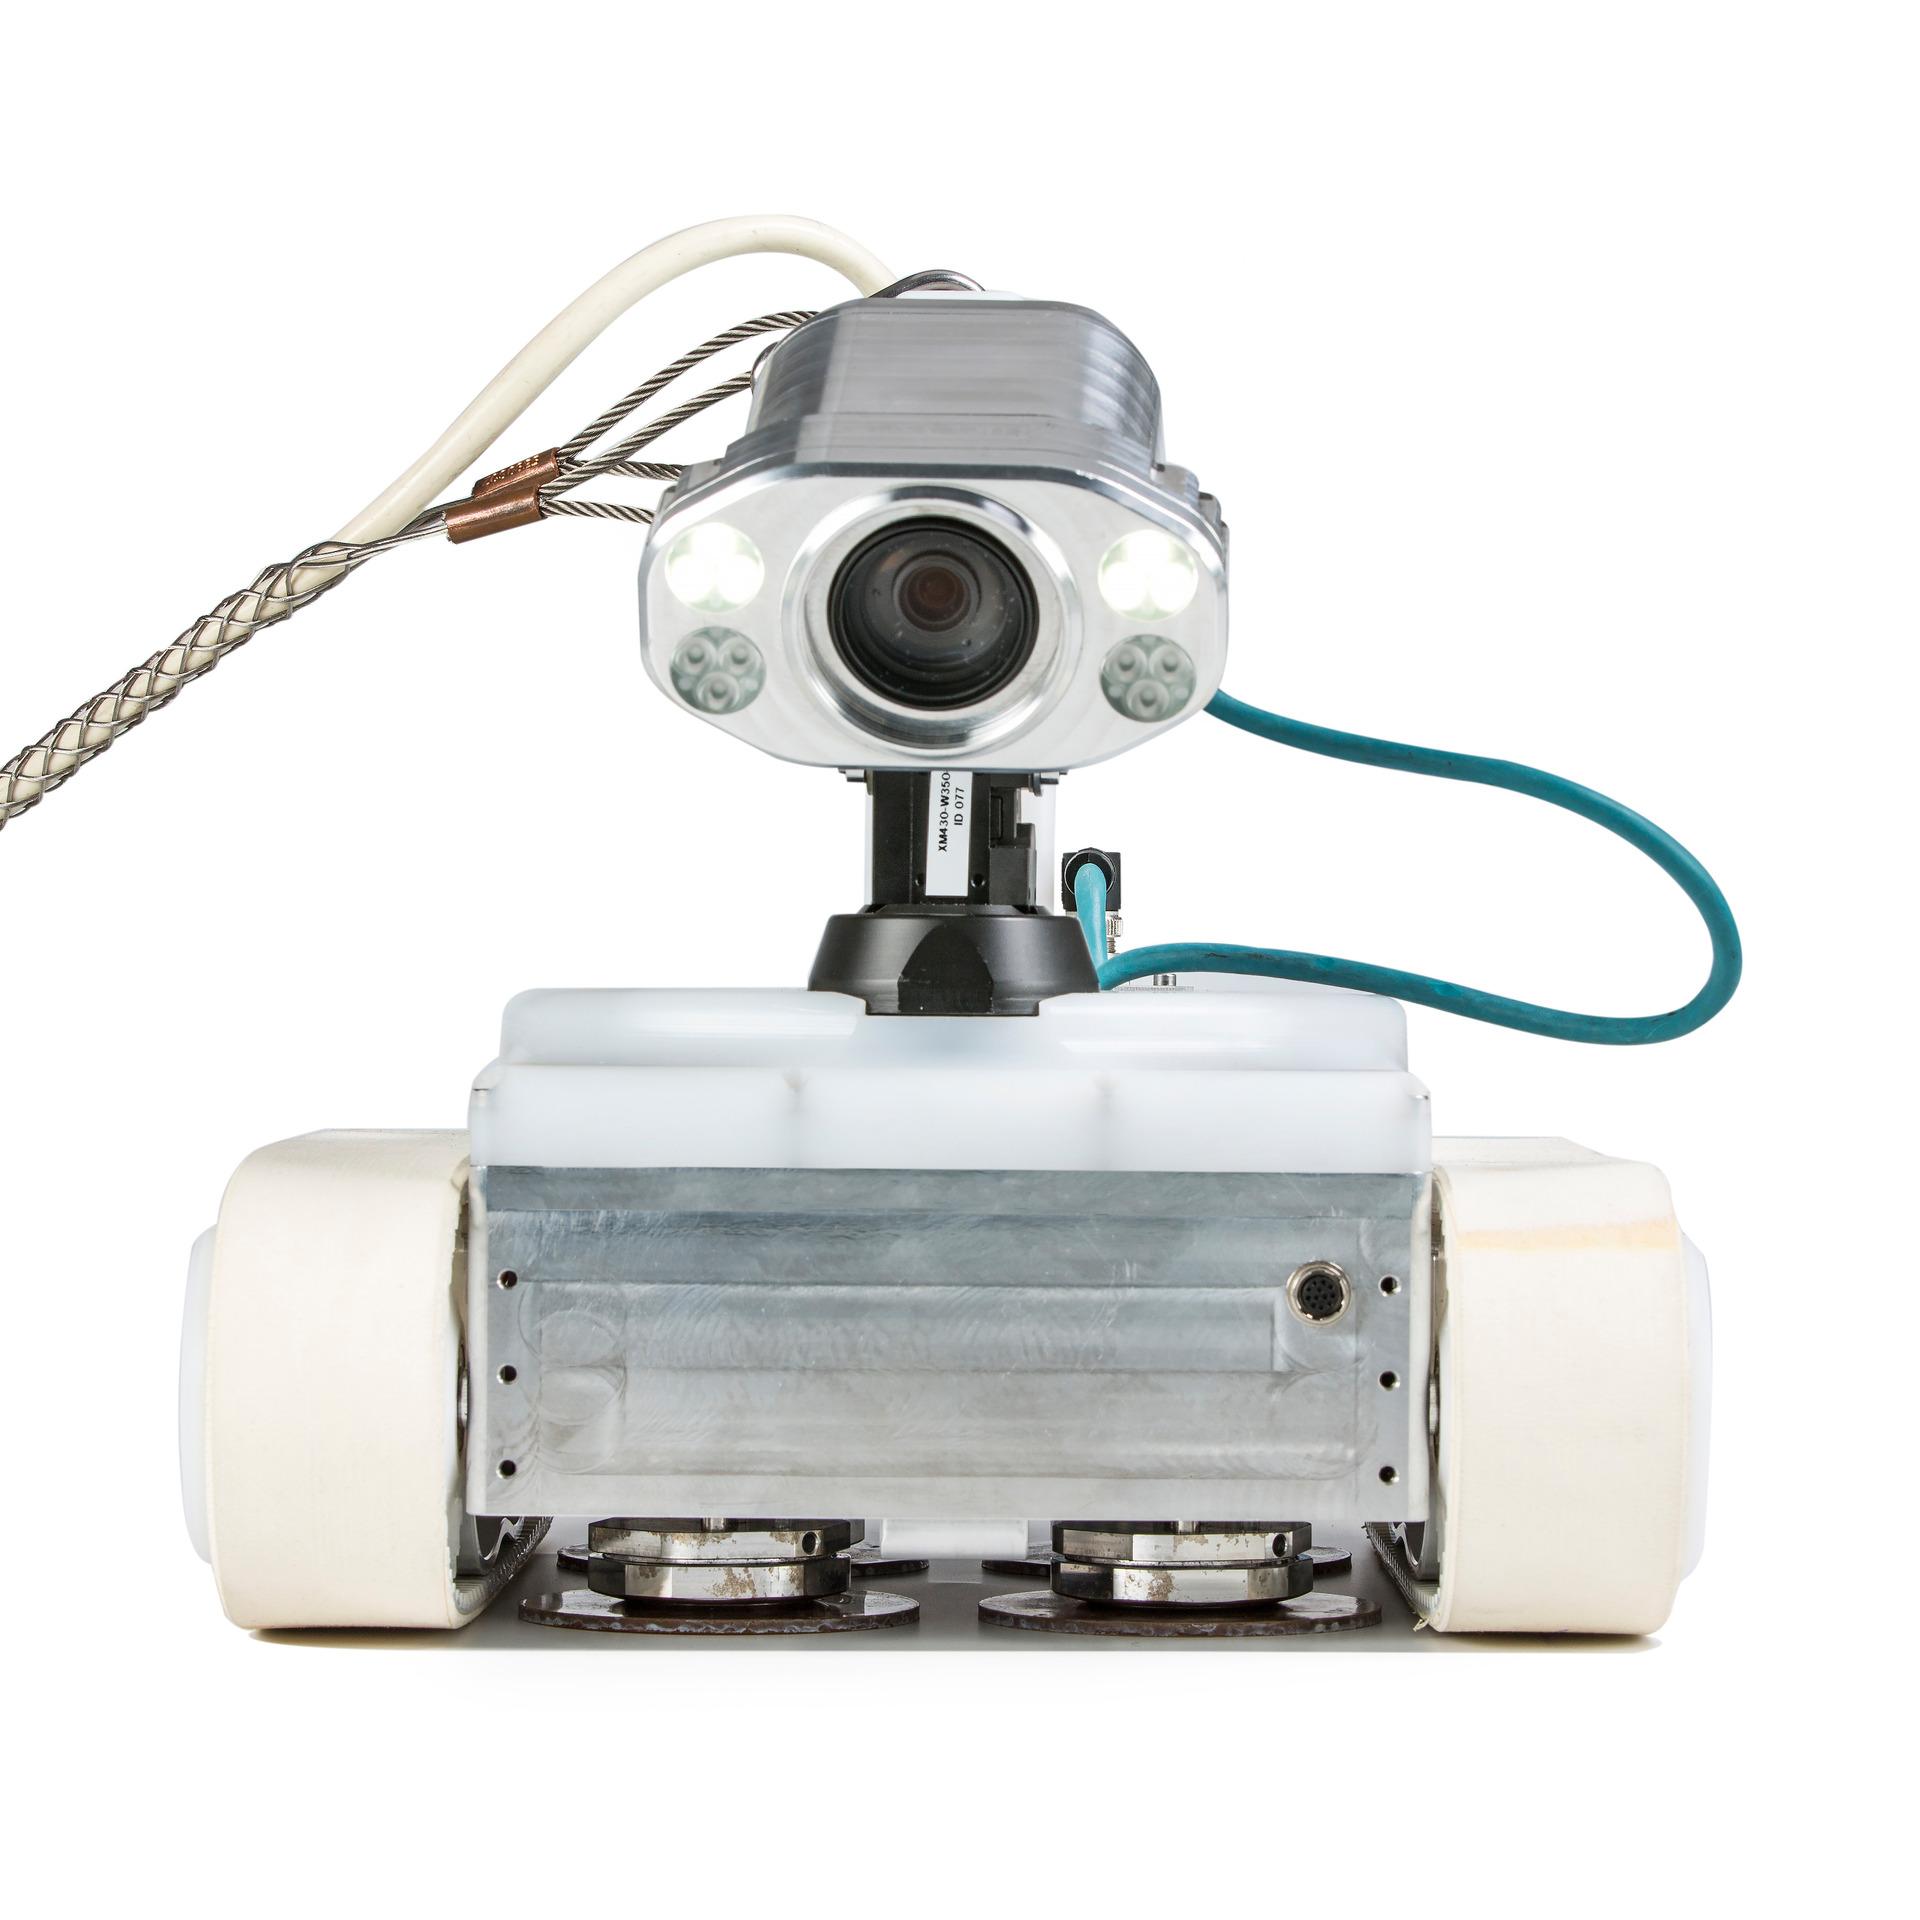 Milk tank robots and sheep science: Five ways Kiwi ingenuity is making industry smarter